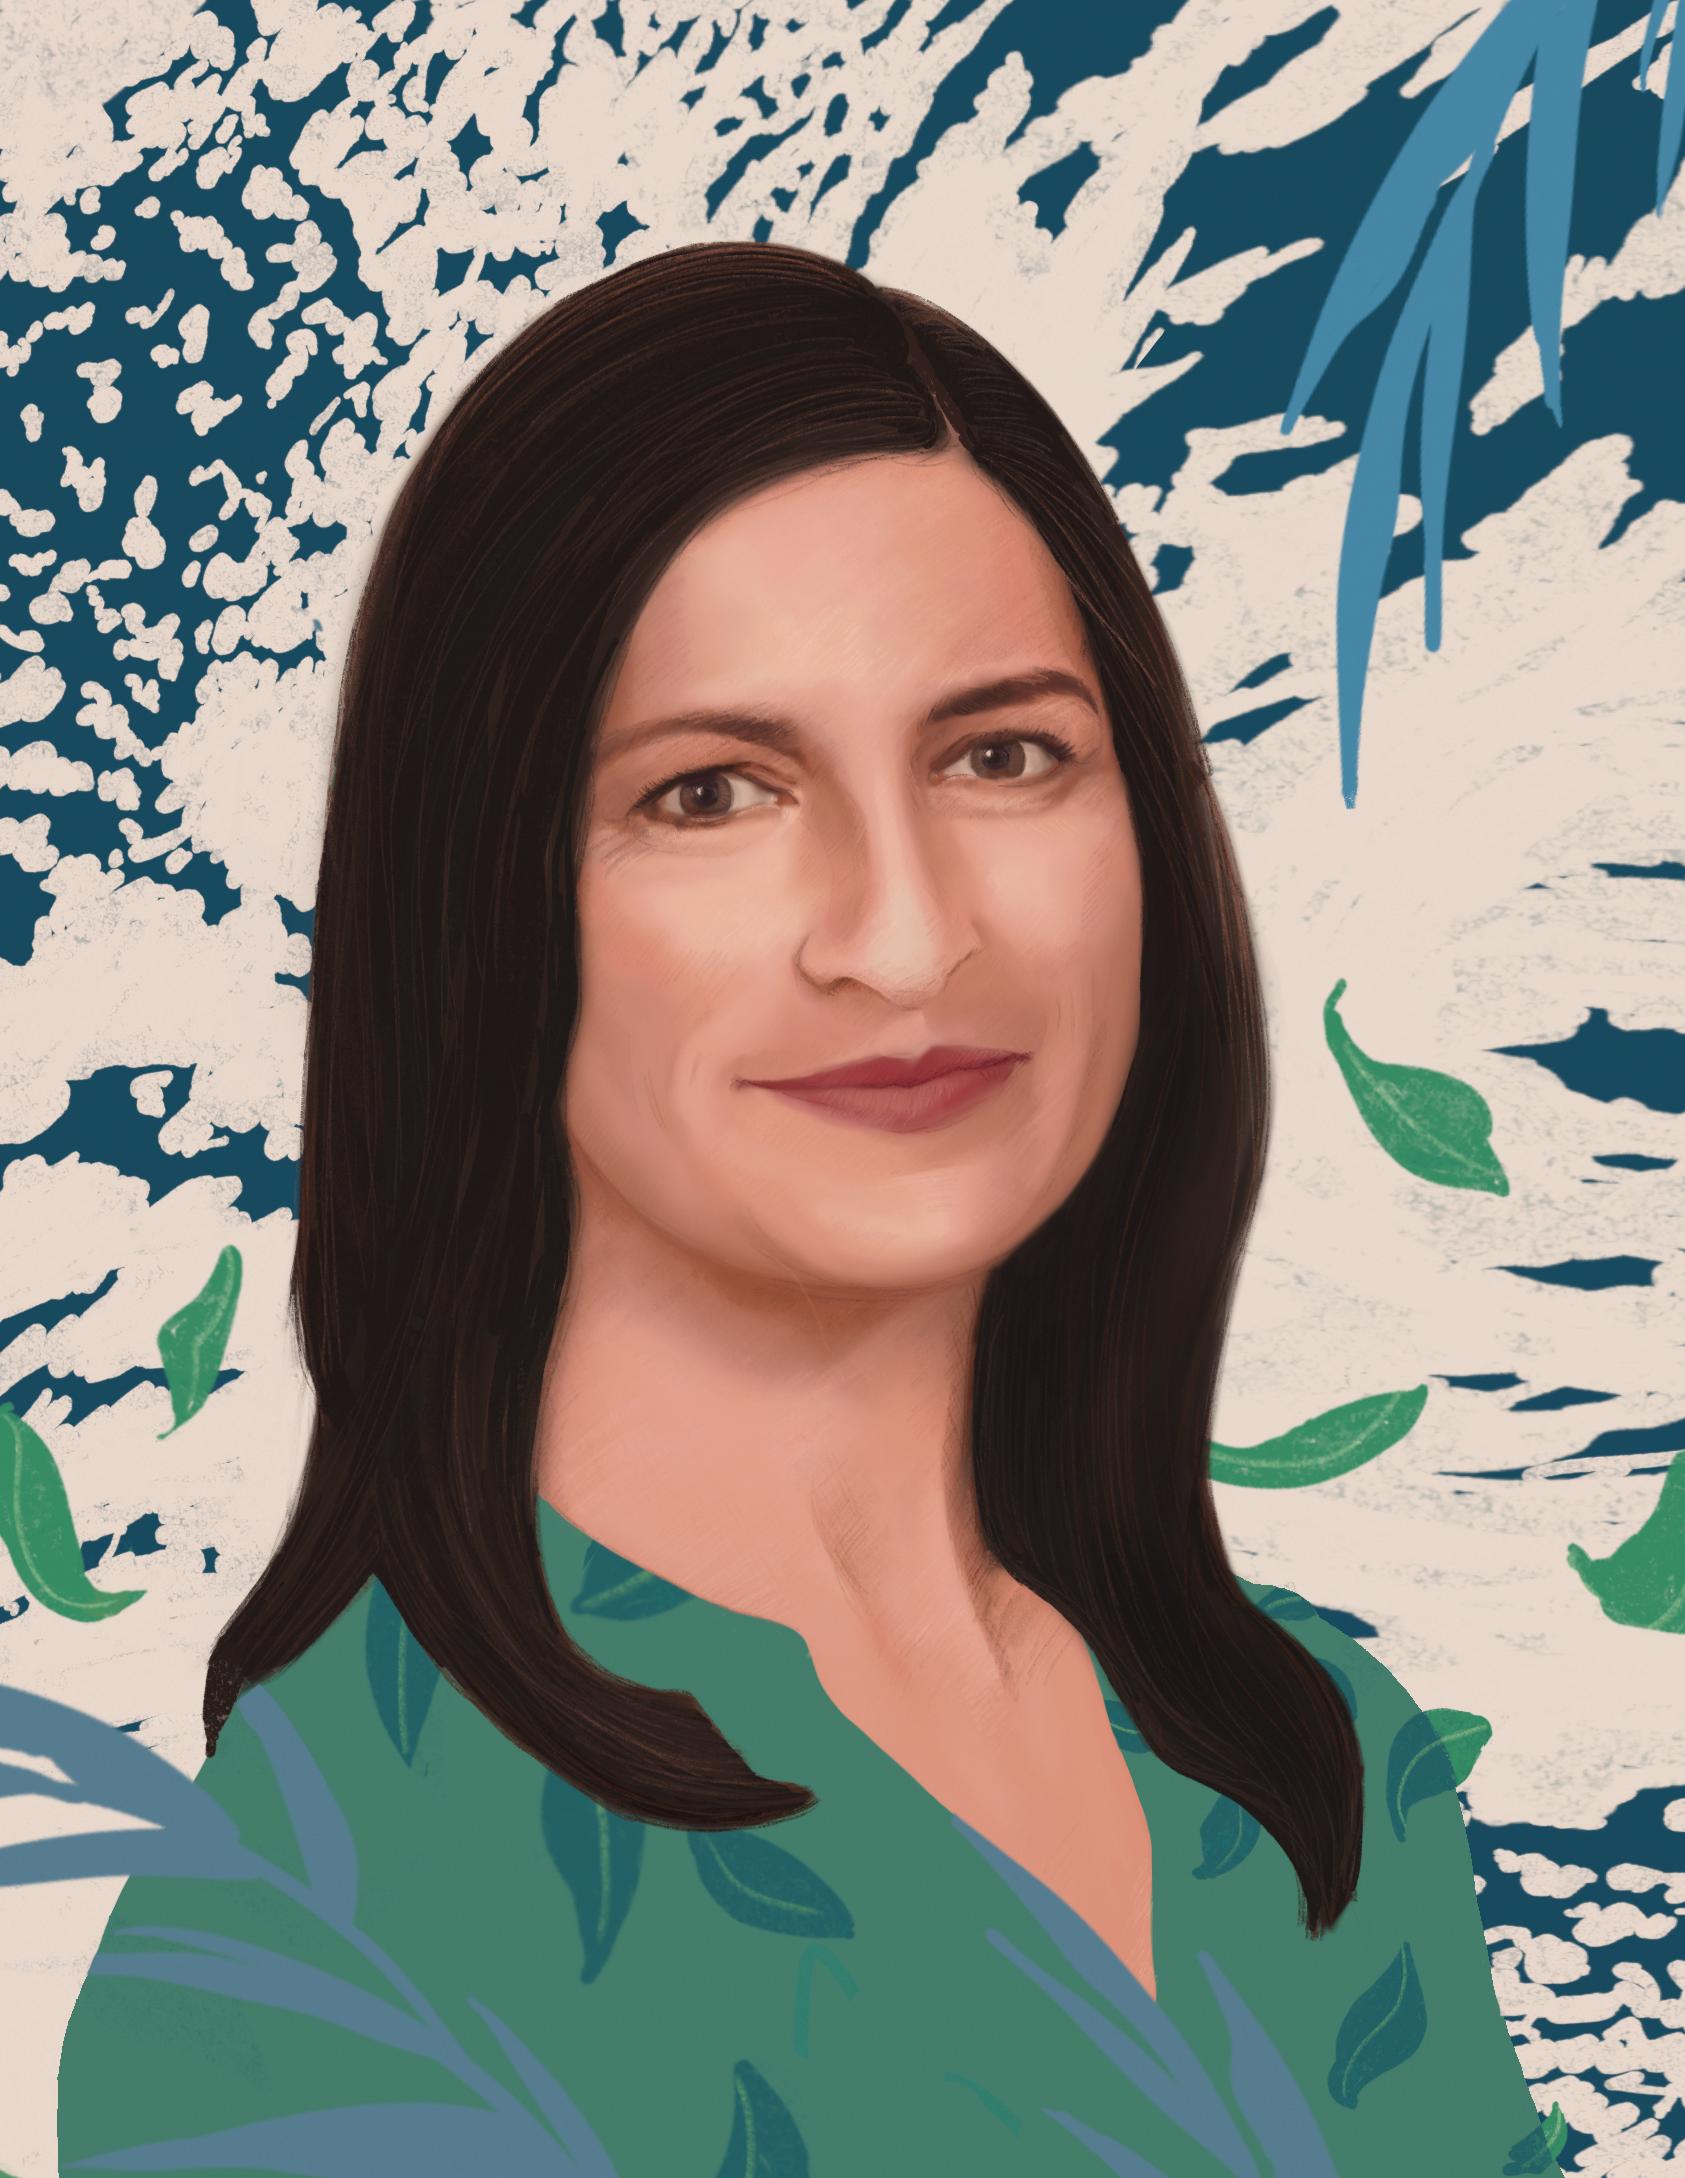 Illustration of Heather Lazrus.